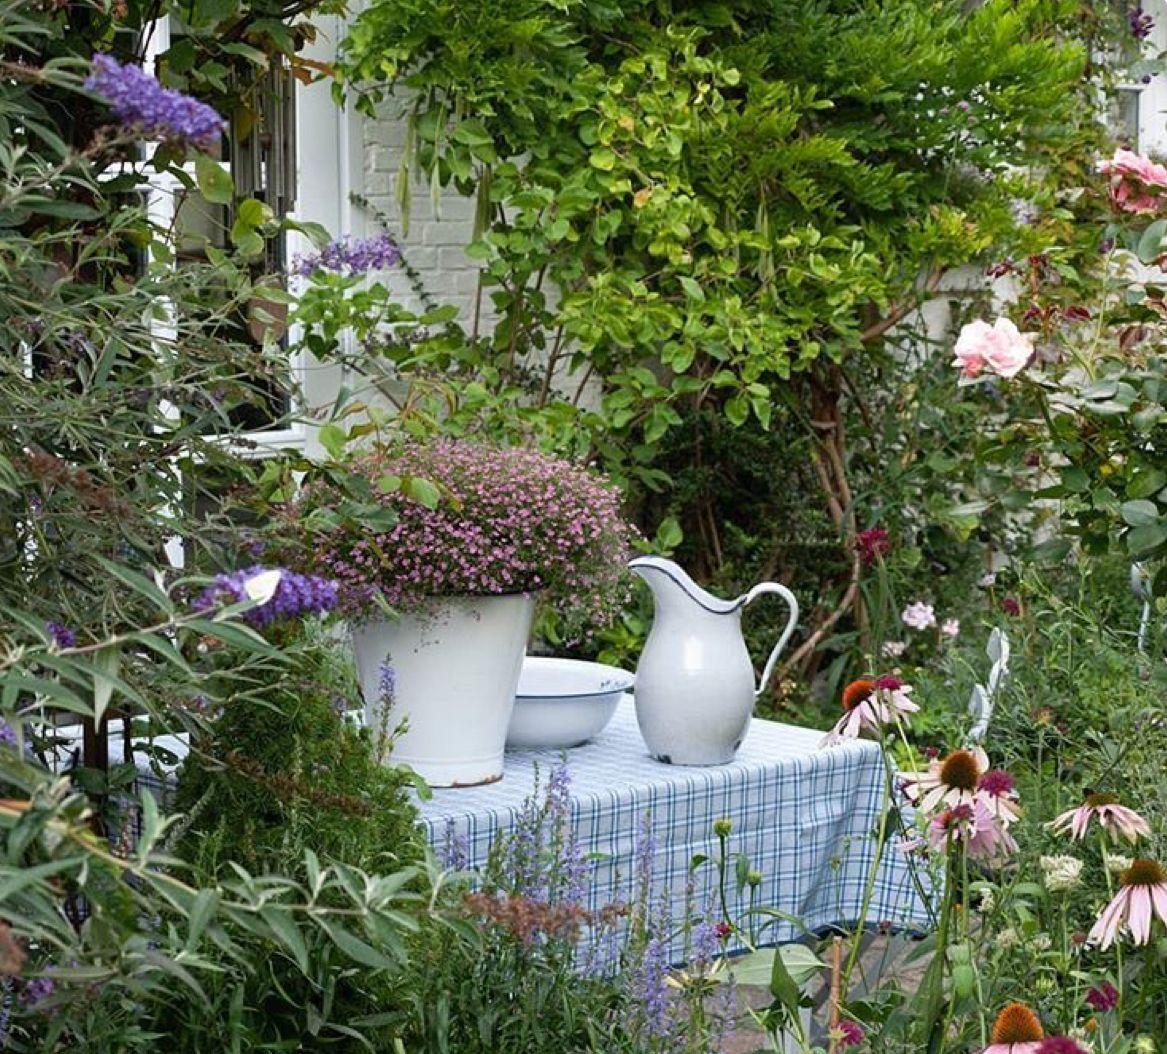 Pin By Gloriacain3 On Floral Haven Cottage Garden Beautiful Gardens Garden Inspiration